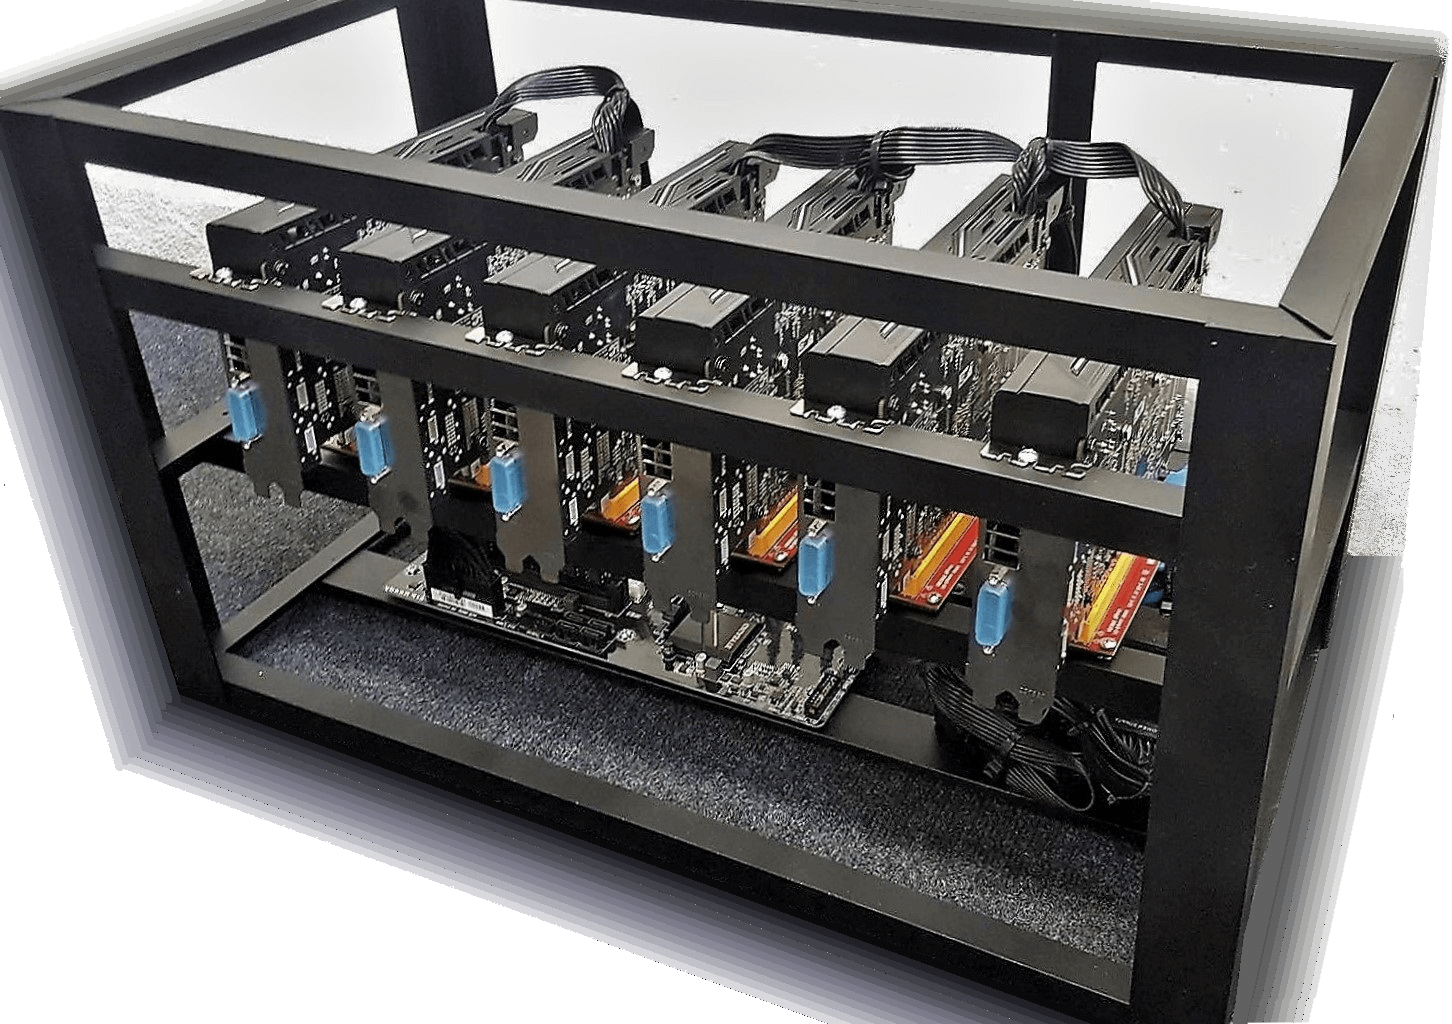 GPU mining RIG – Profi Výroba už od @2015. PLUG-&-PLAY system.